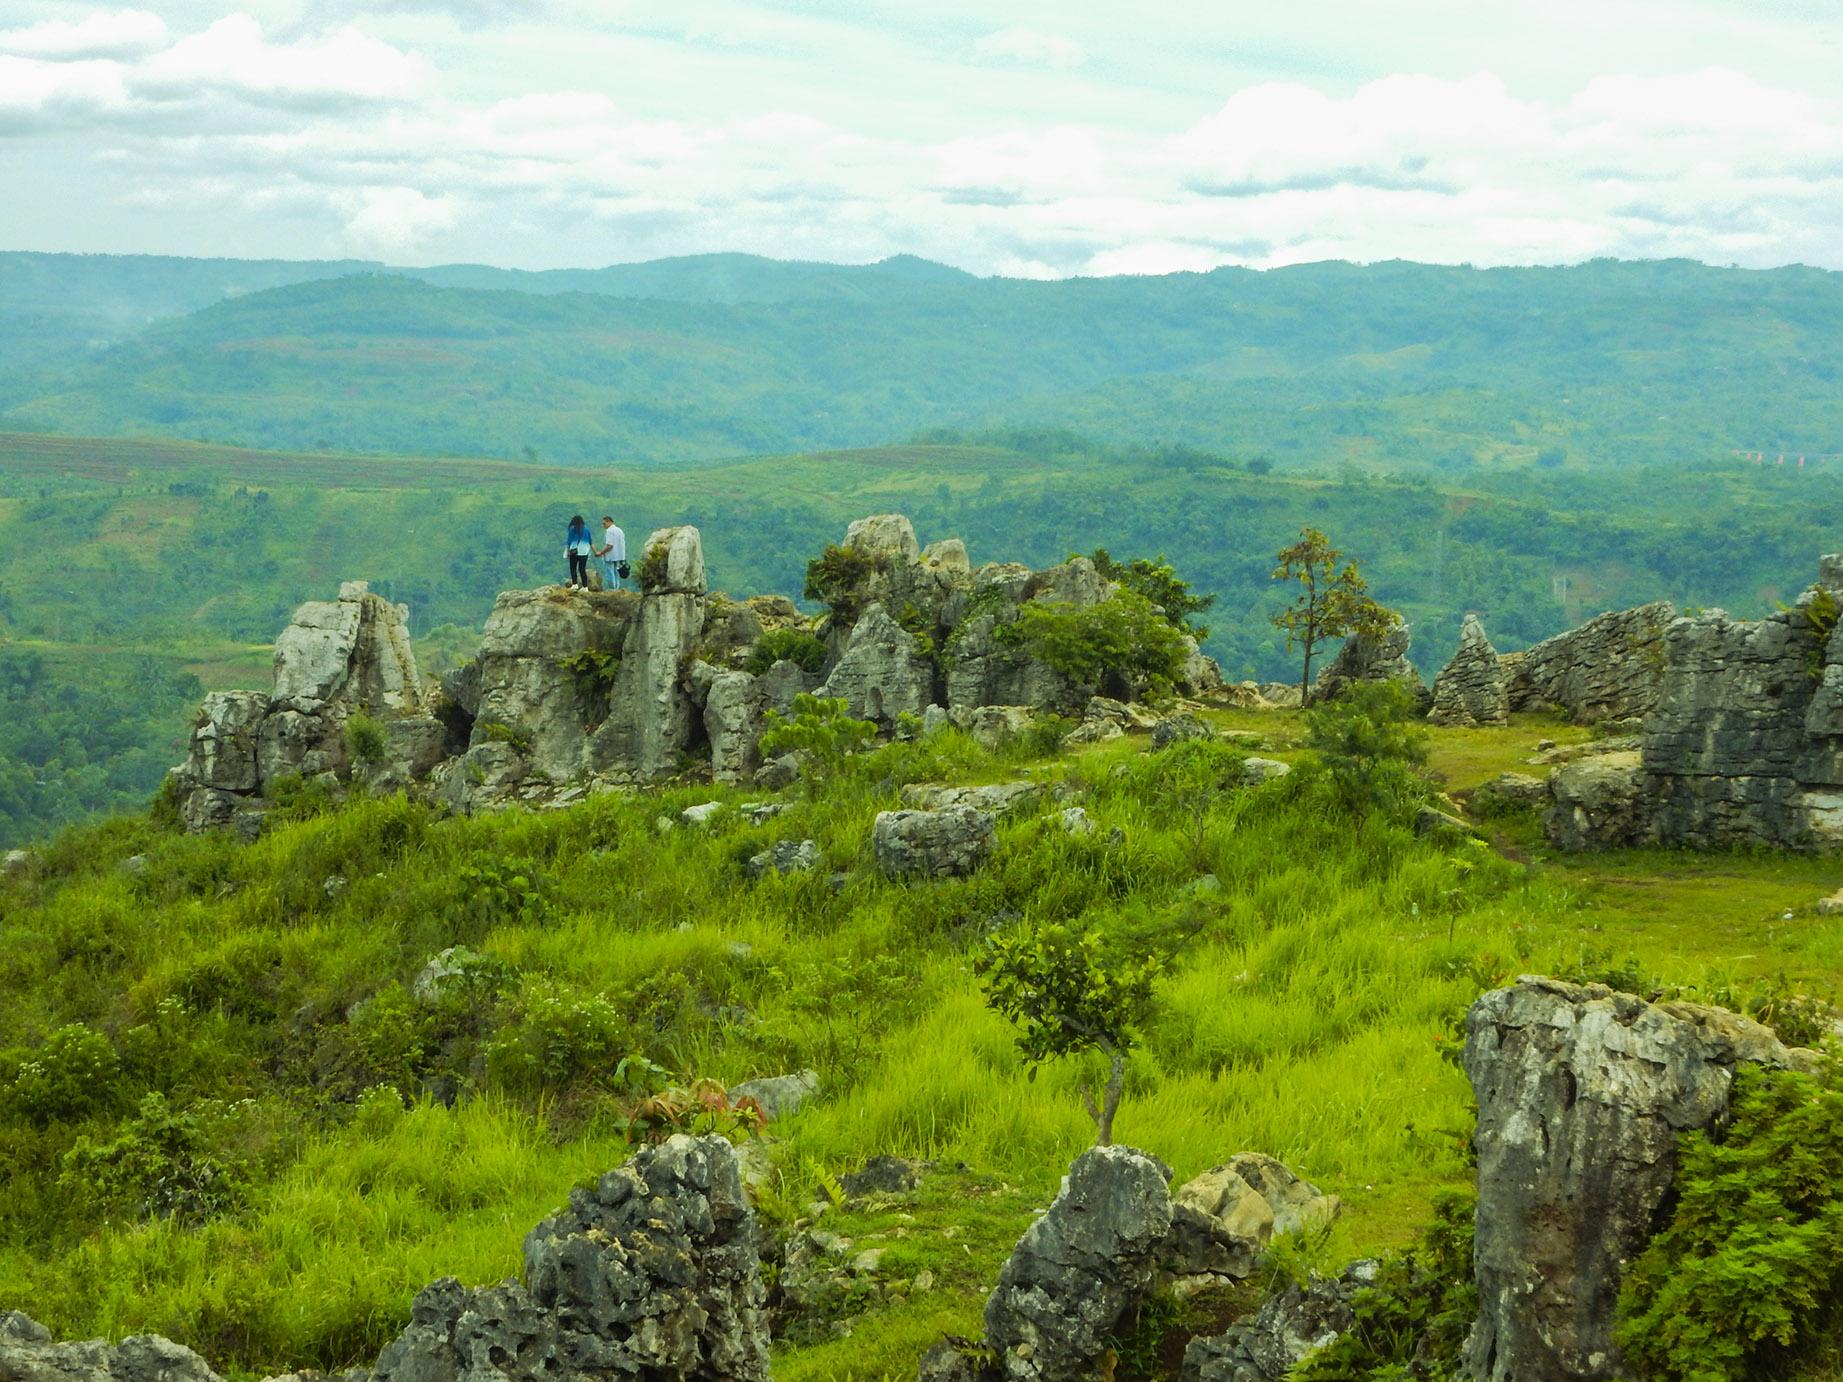 lokasi instagramable stone garden padalarang